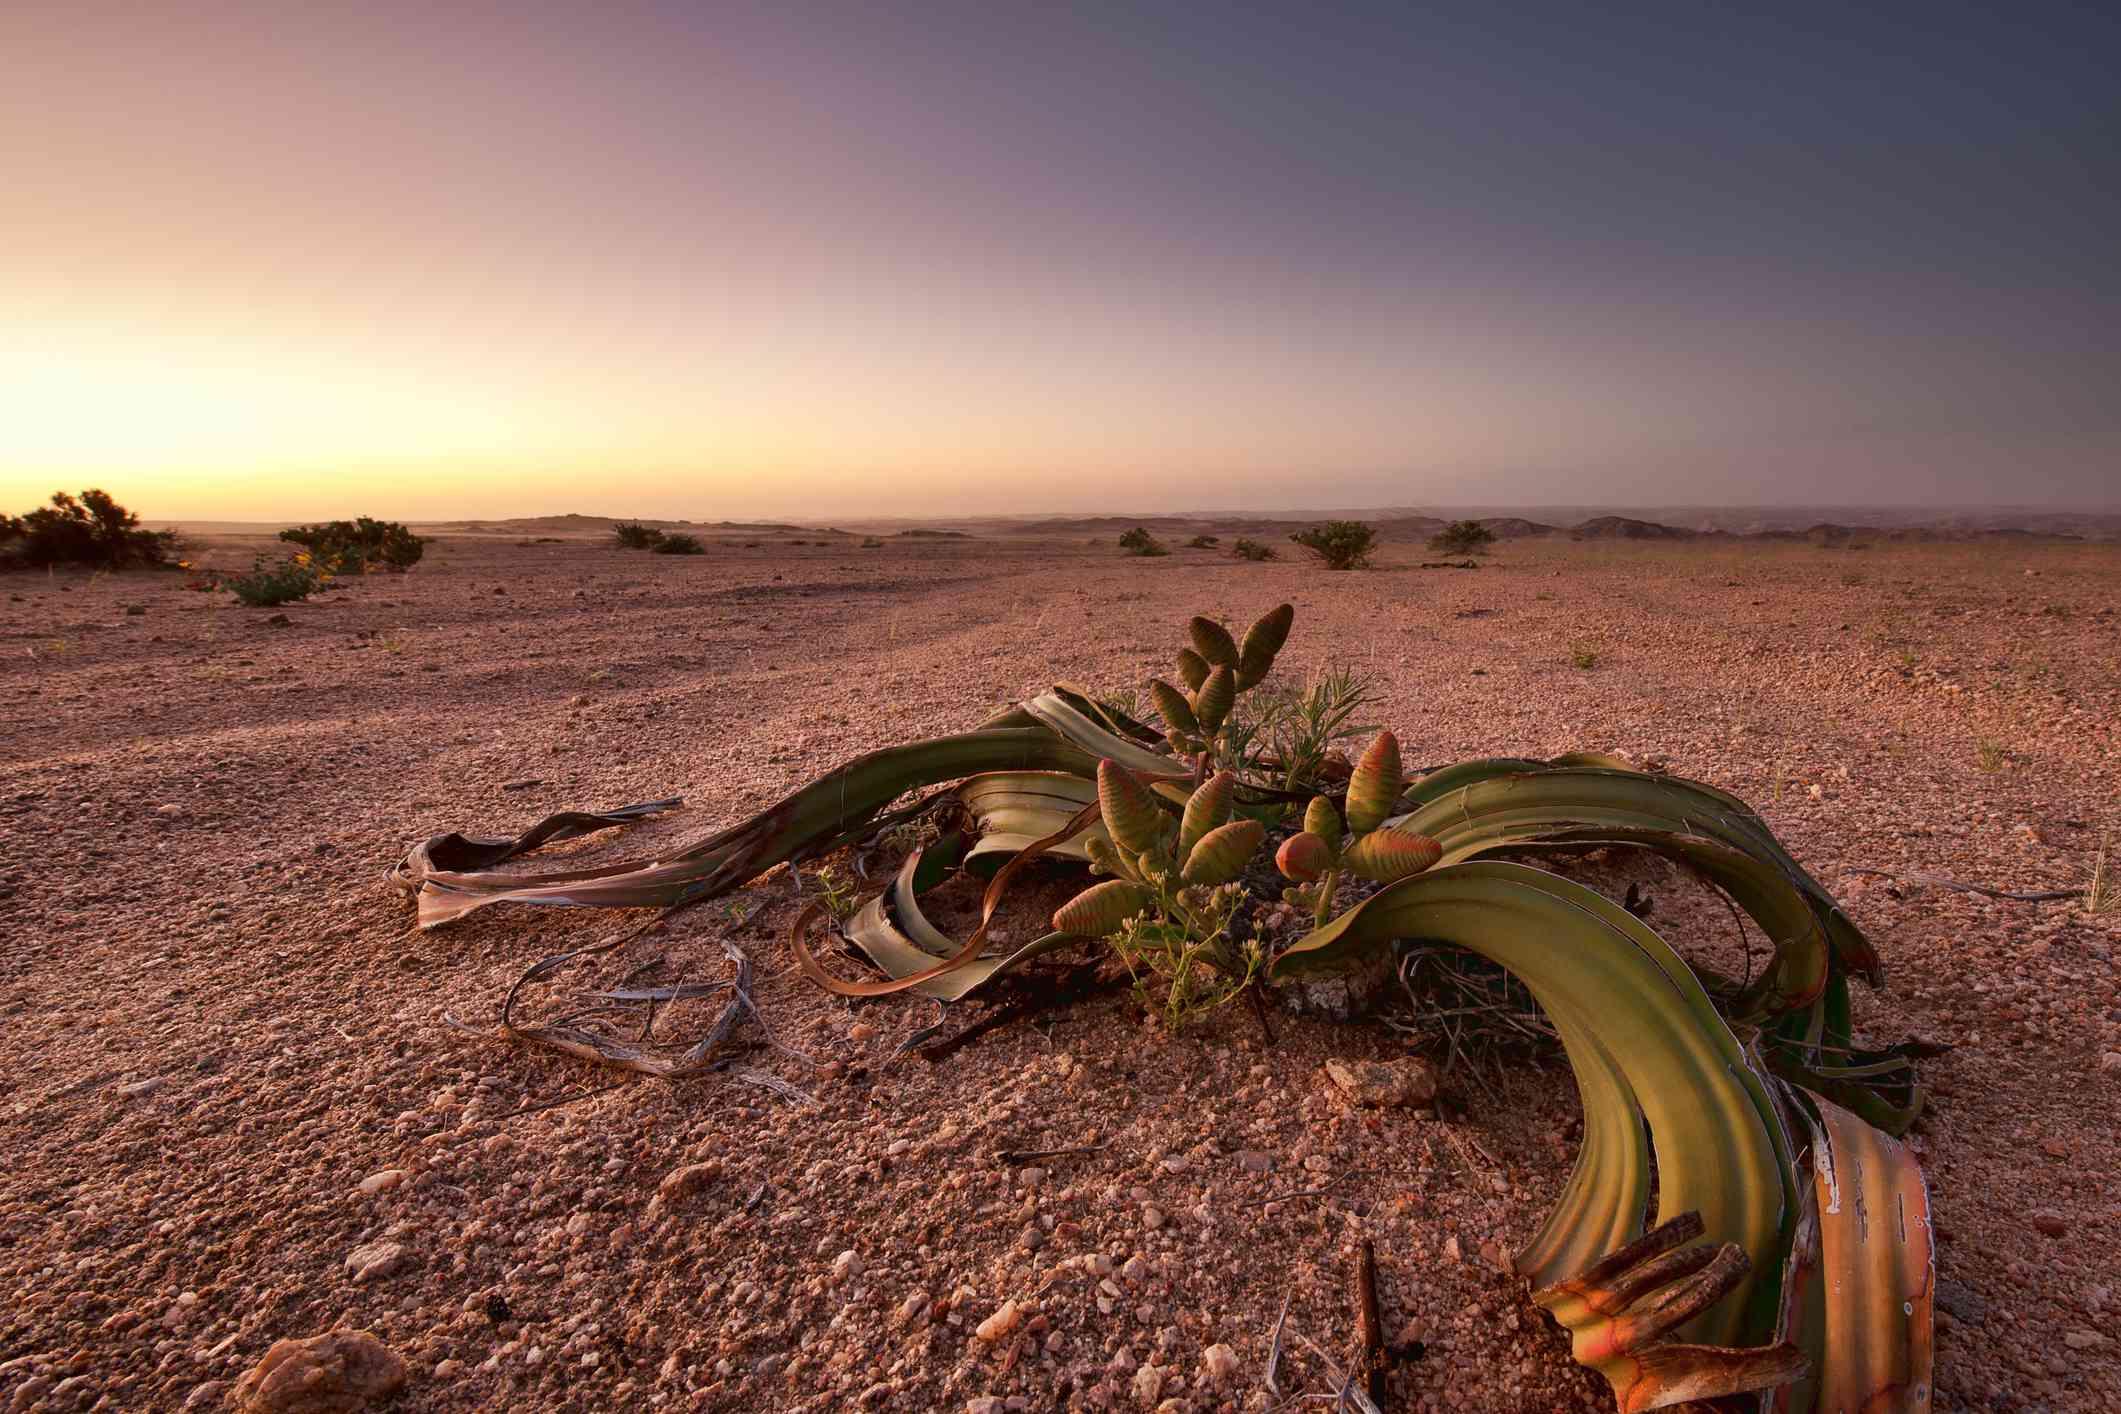 Tree tumbo (Welwitschia mirabilis)